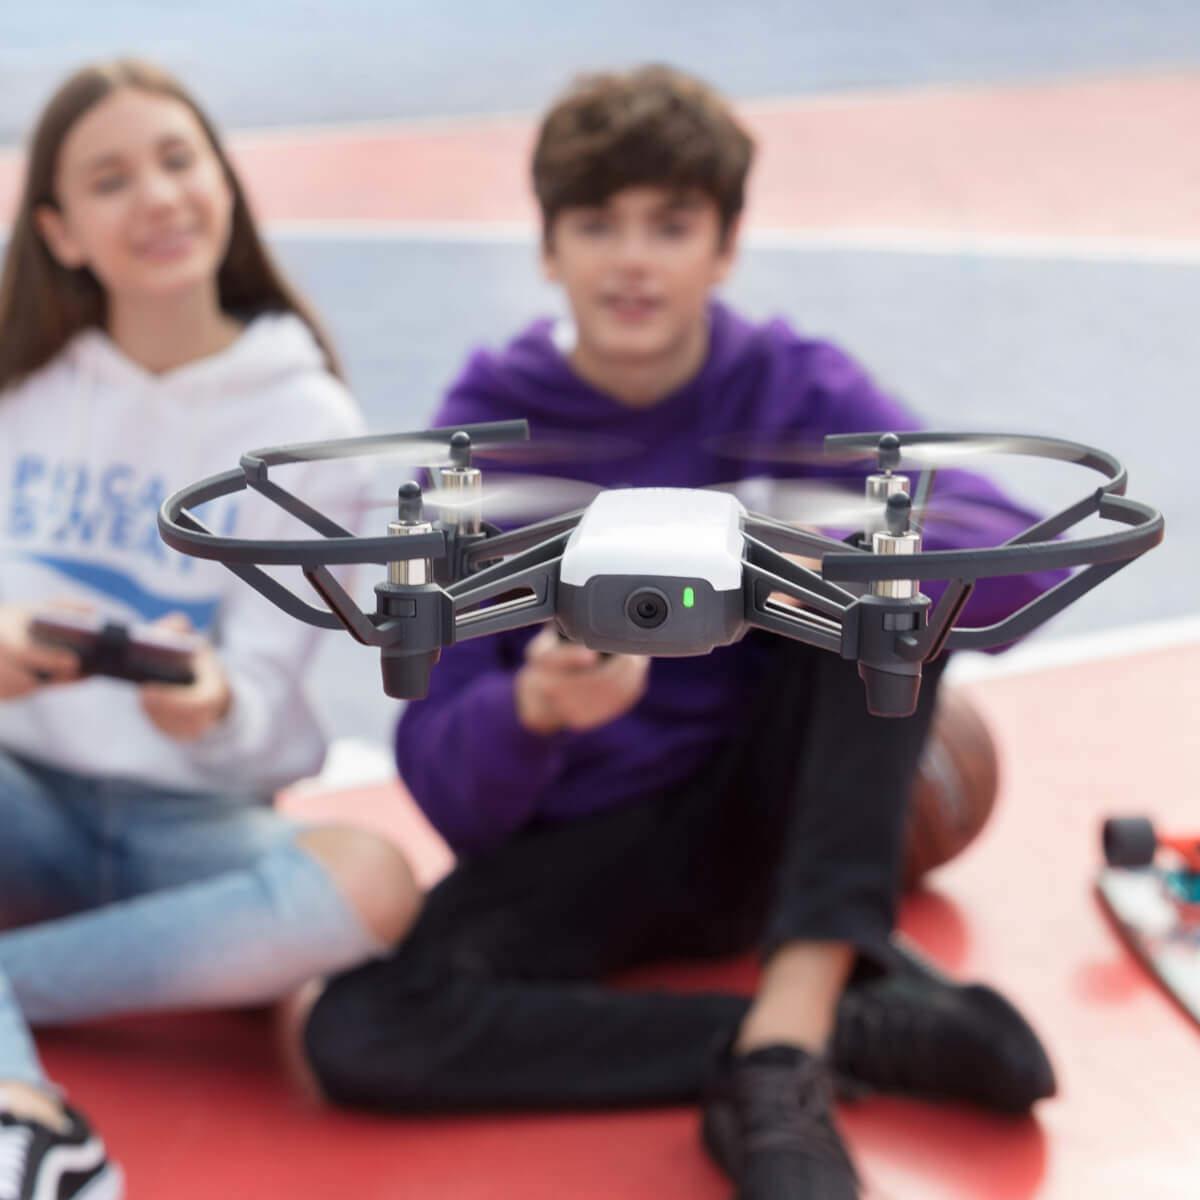 Dronovi snimanje iz zraka dron letelice sa kamerom - snimanje iz visine cena prodaja srbija beograd servisni priručnik